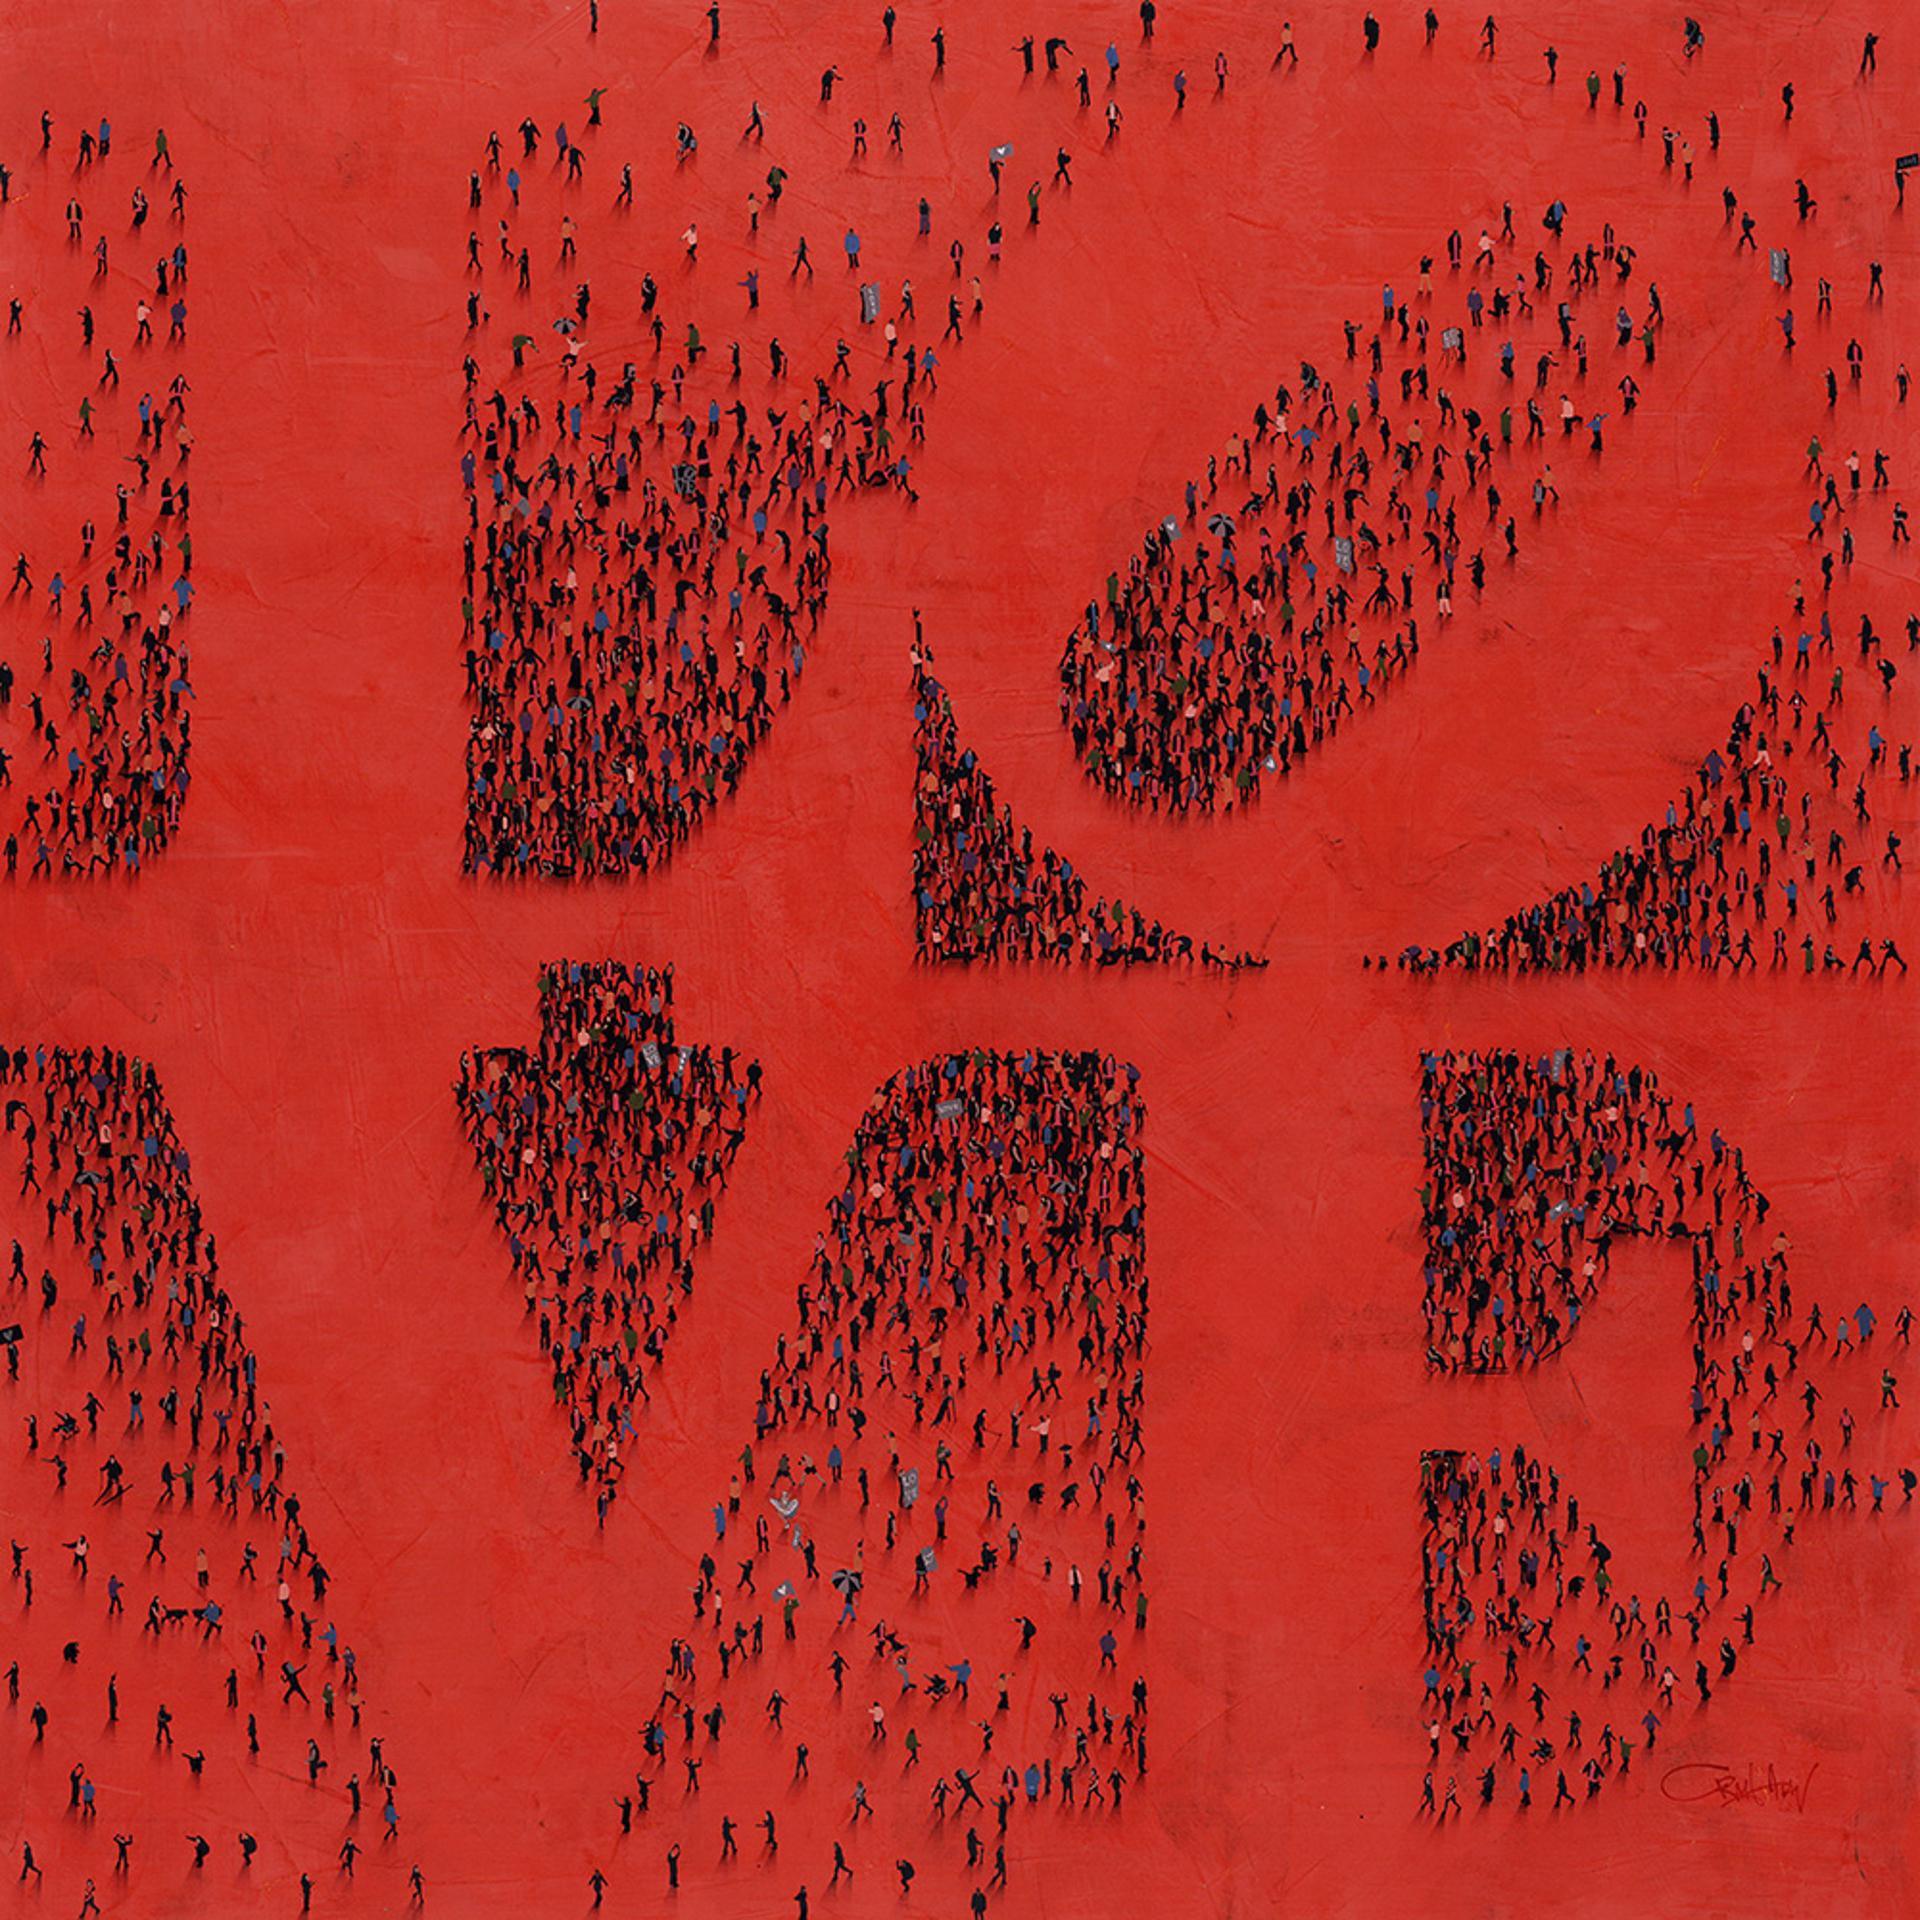 Everyone (SOLD)  by Craig Alan, Populus Homage